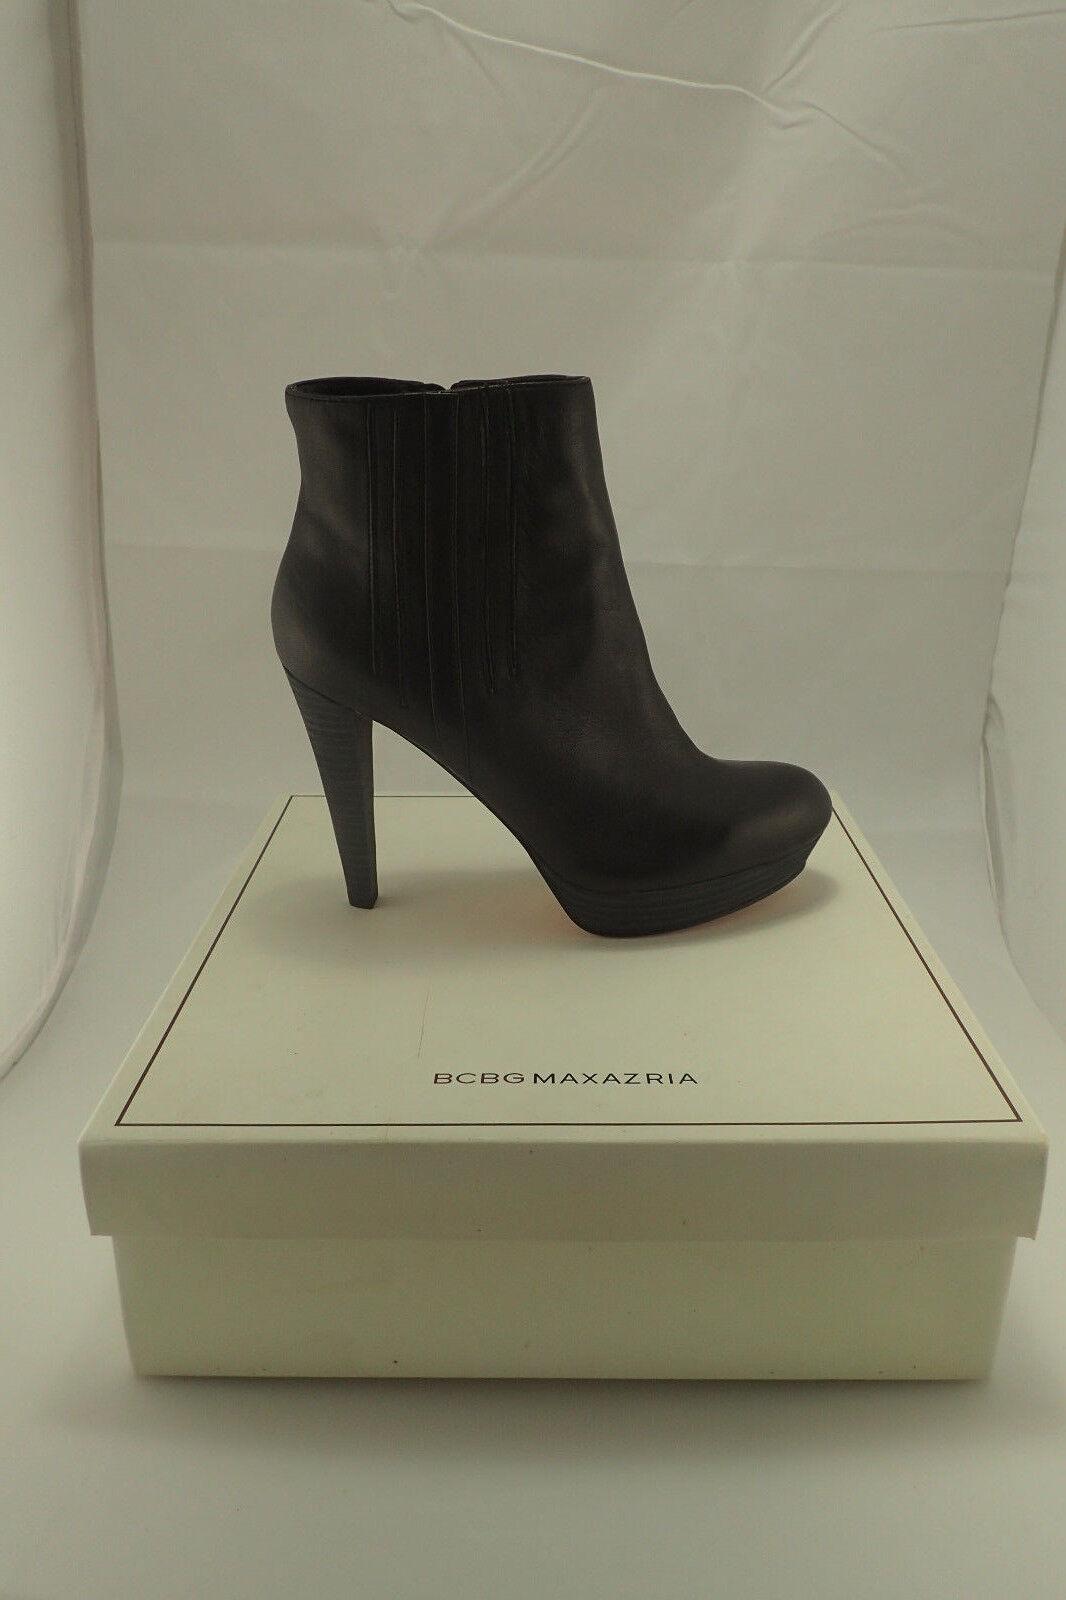 NIB BCBG Max Azria Henley Black Leather Bootie High Heels size. 9.5 FREE GIFT